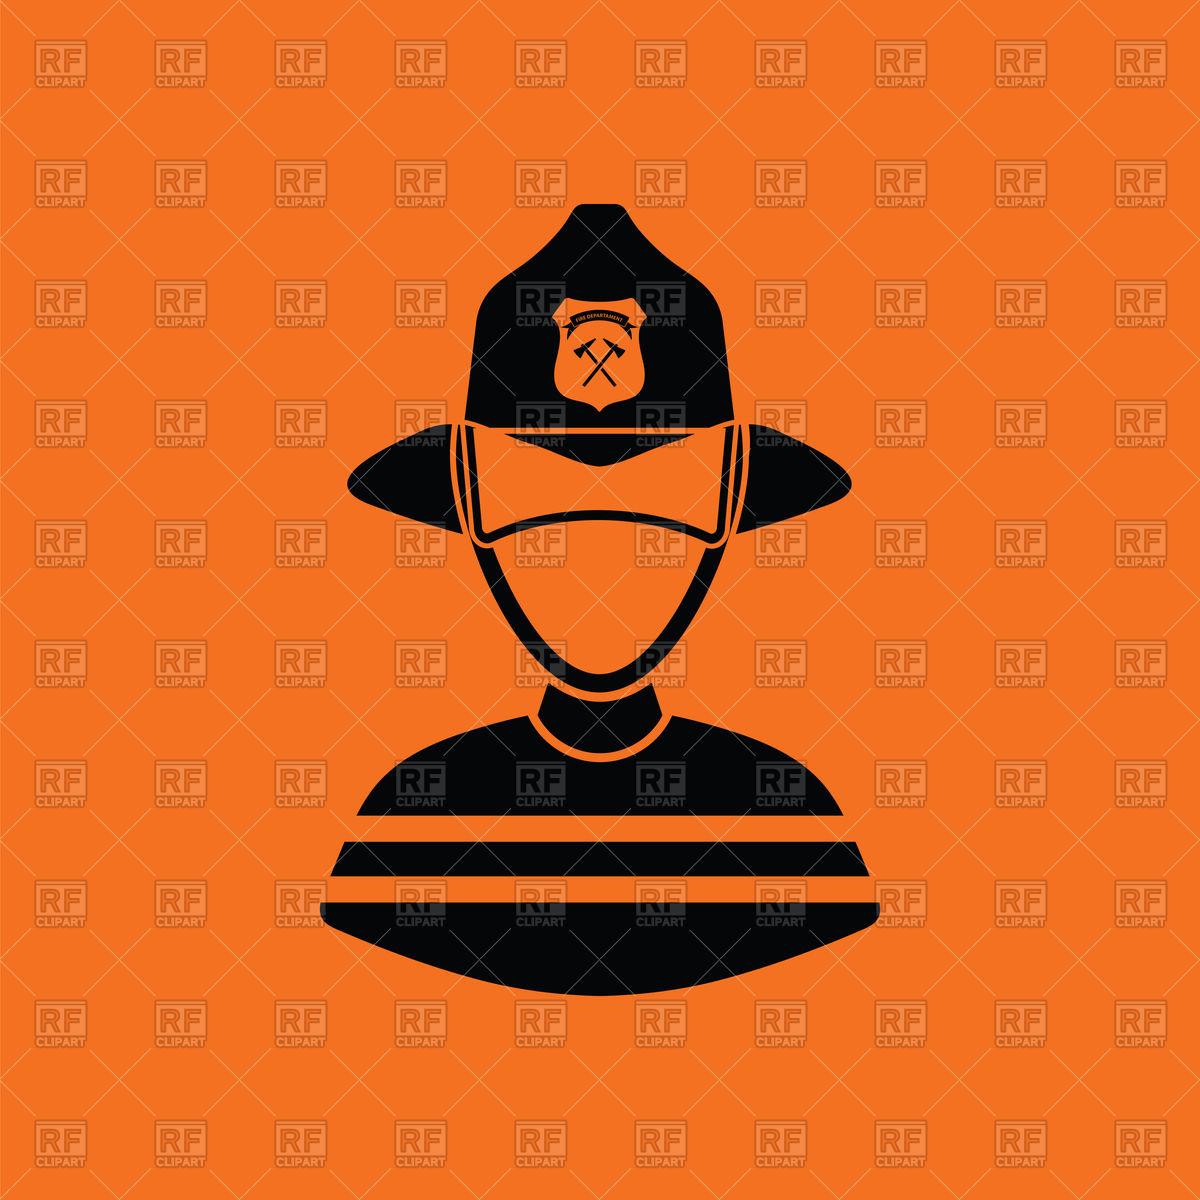 1200x1200 Fireman Icon On Orange Background